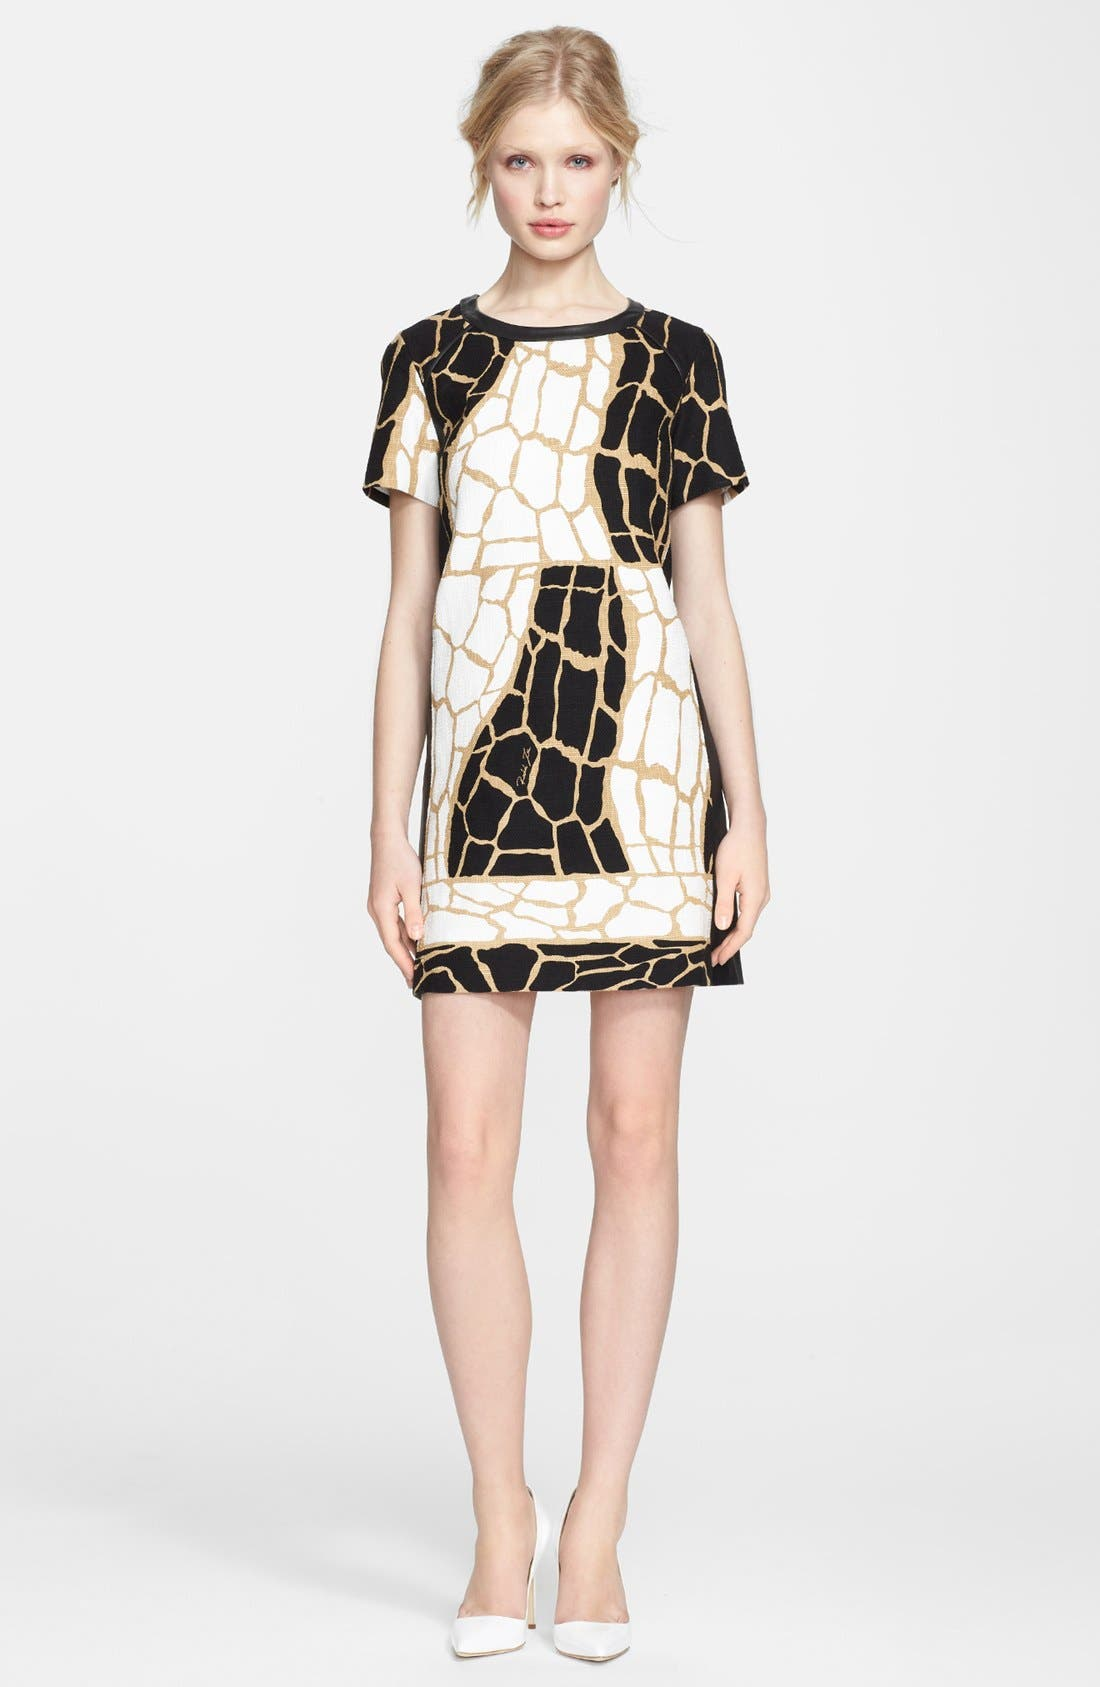 Main Image - Rachel Zoe 'Landon' Giraffe Print Dress